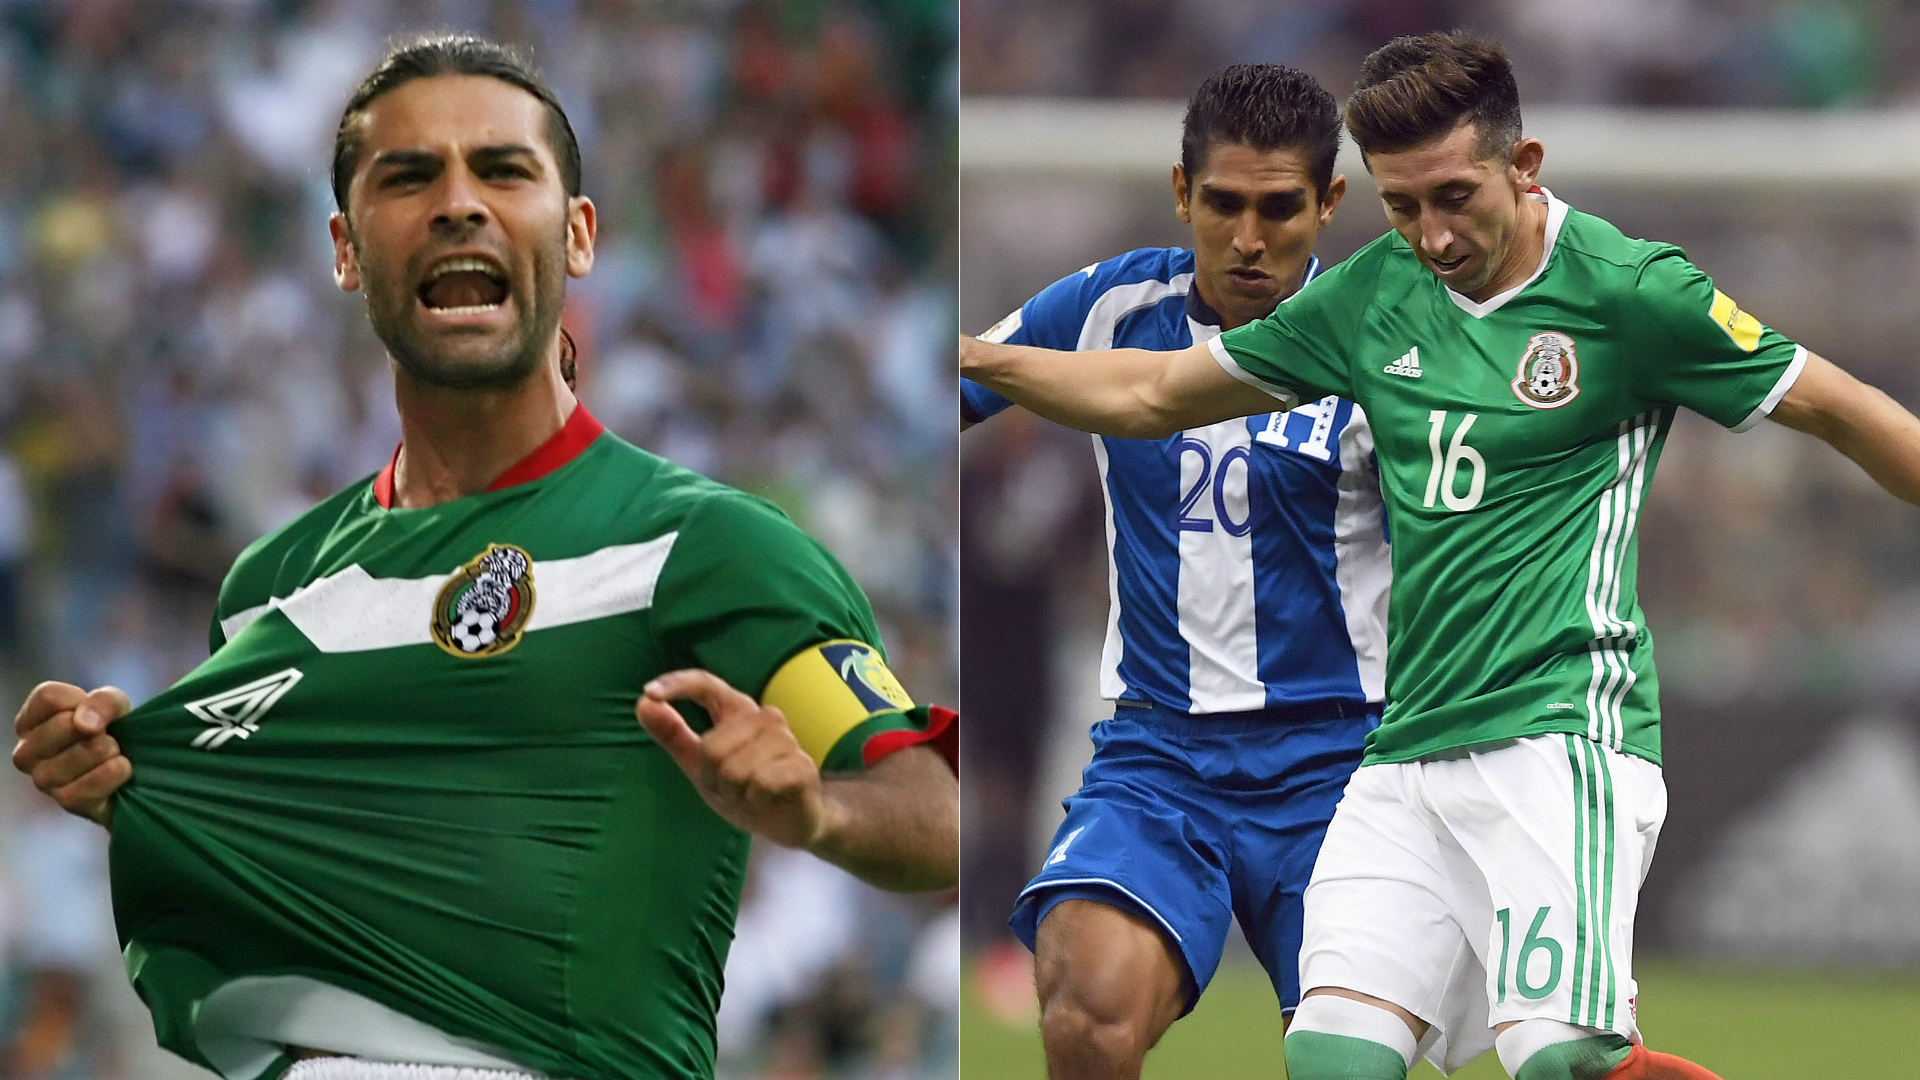 Rafa Márquez vs Herrera